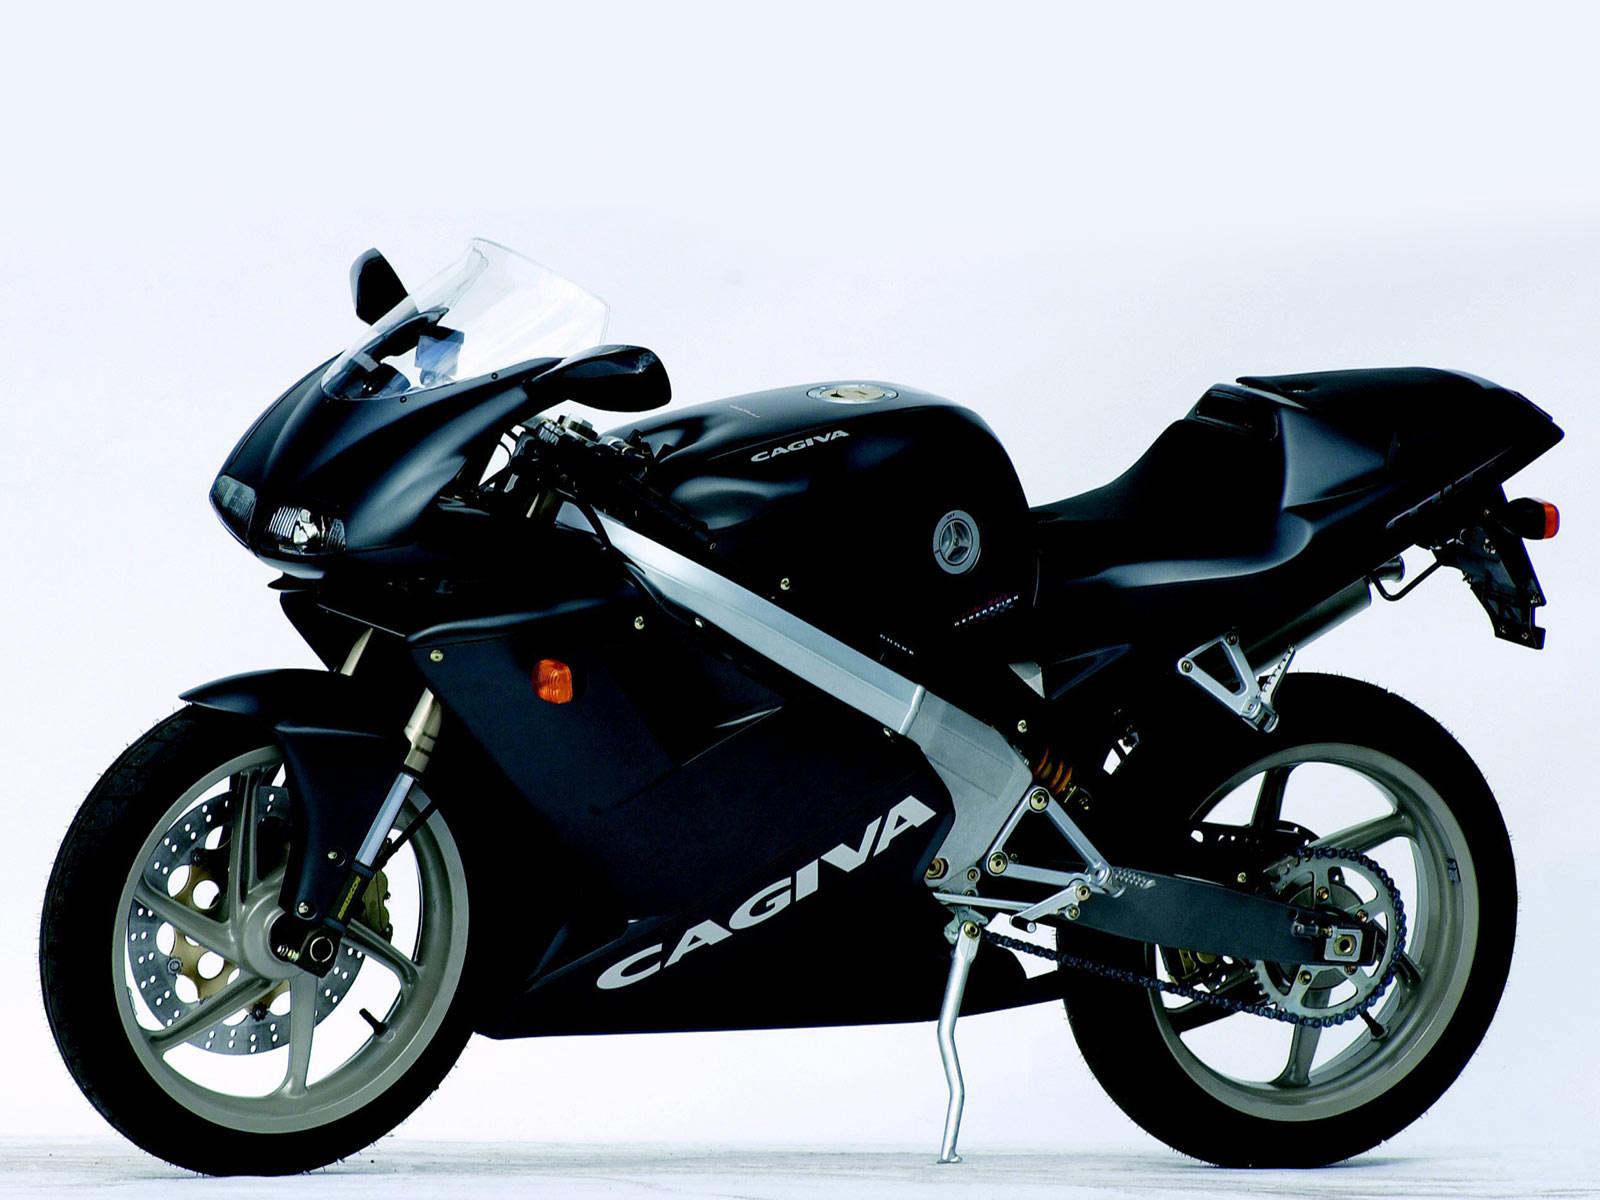 2005 cagiva navigator 1000 motorcycle desktop wallpaper. Black Bedroom Furniture Sets. Home Design Ideas